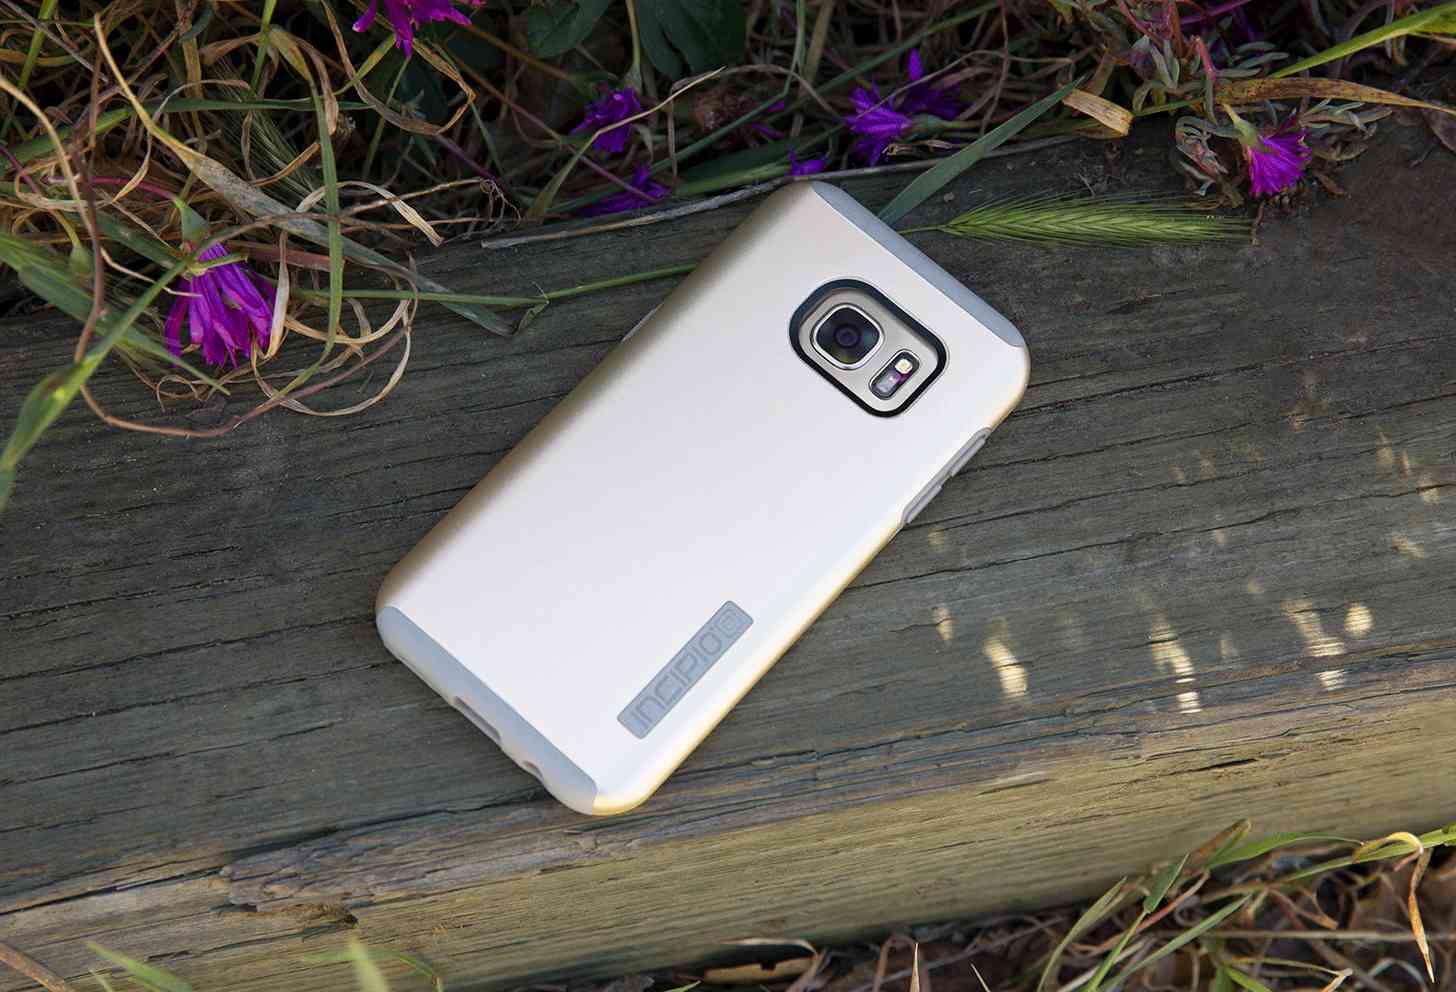 Incipio case Galaxy S7 edge